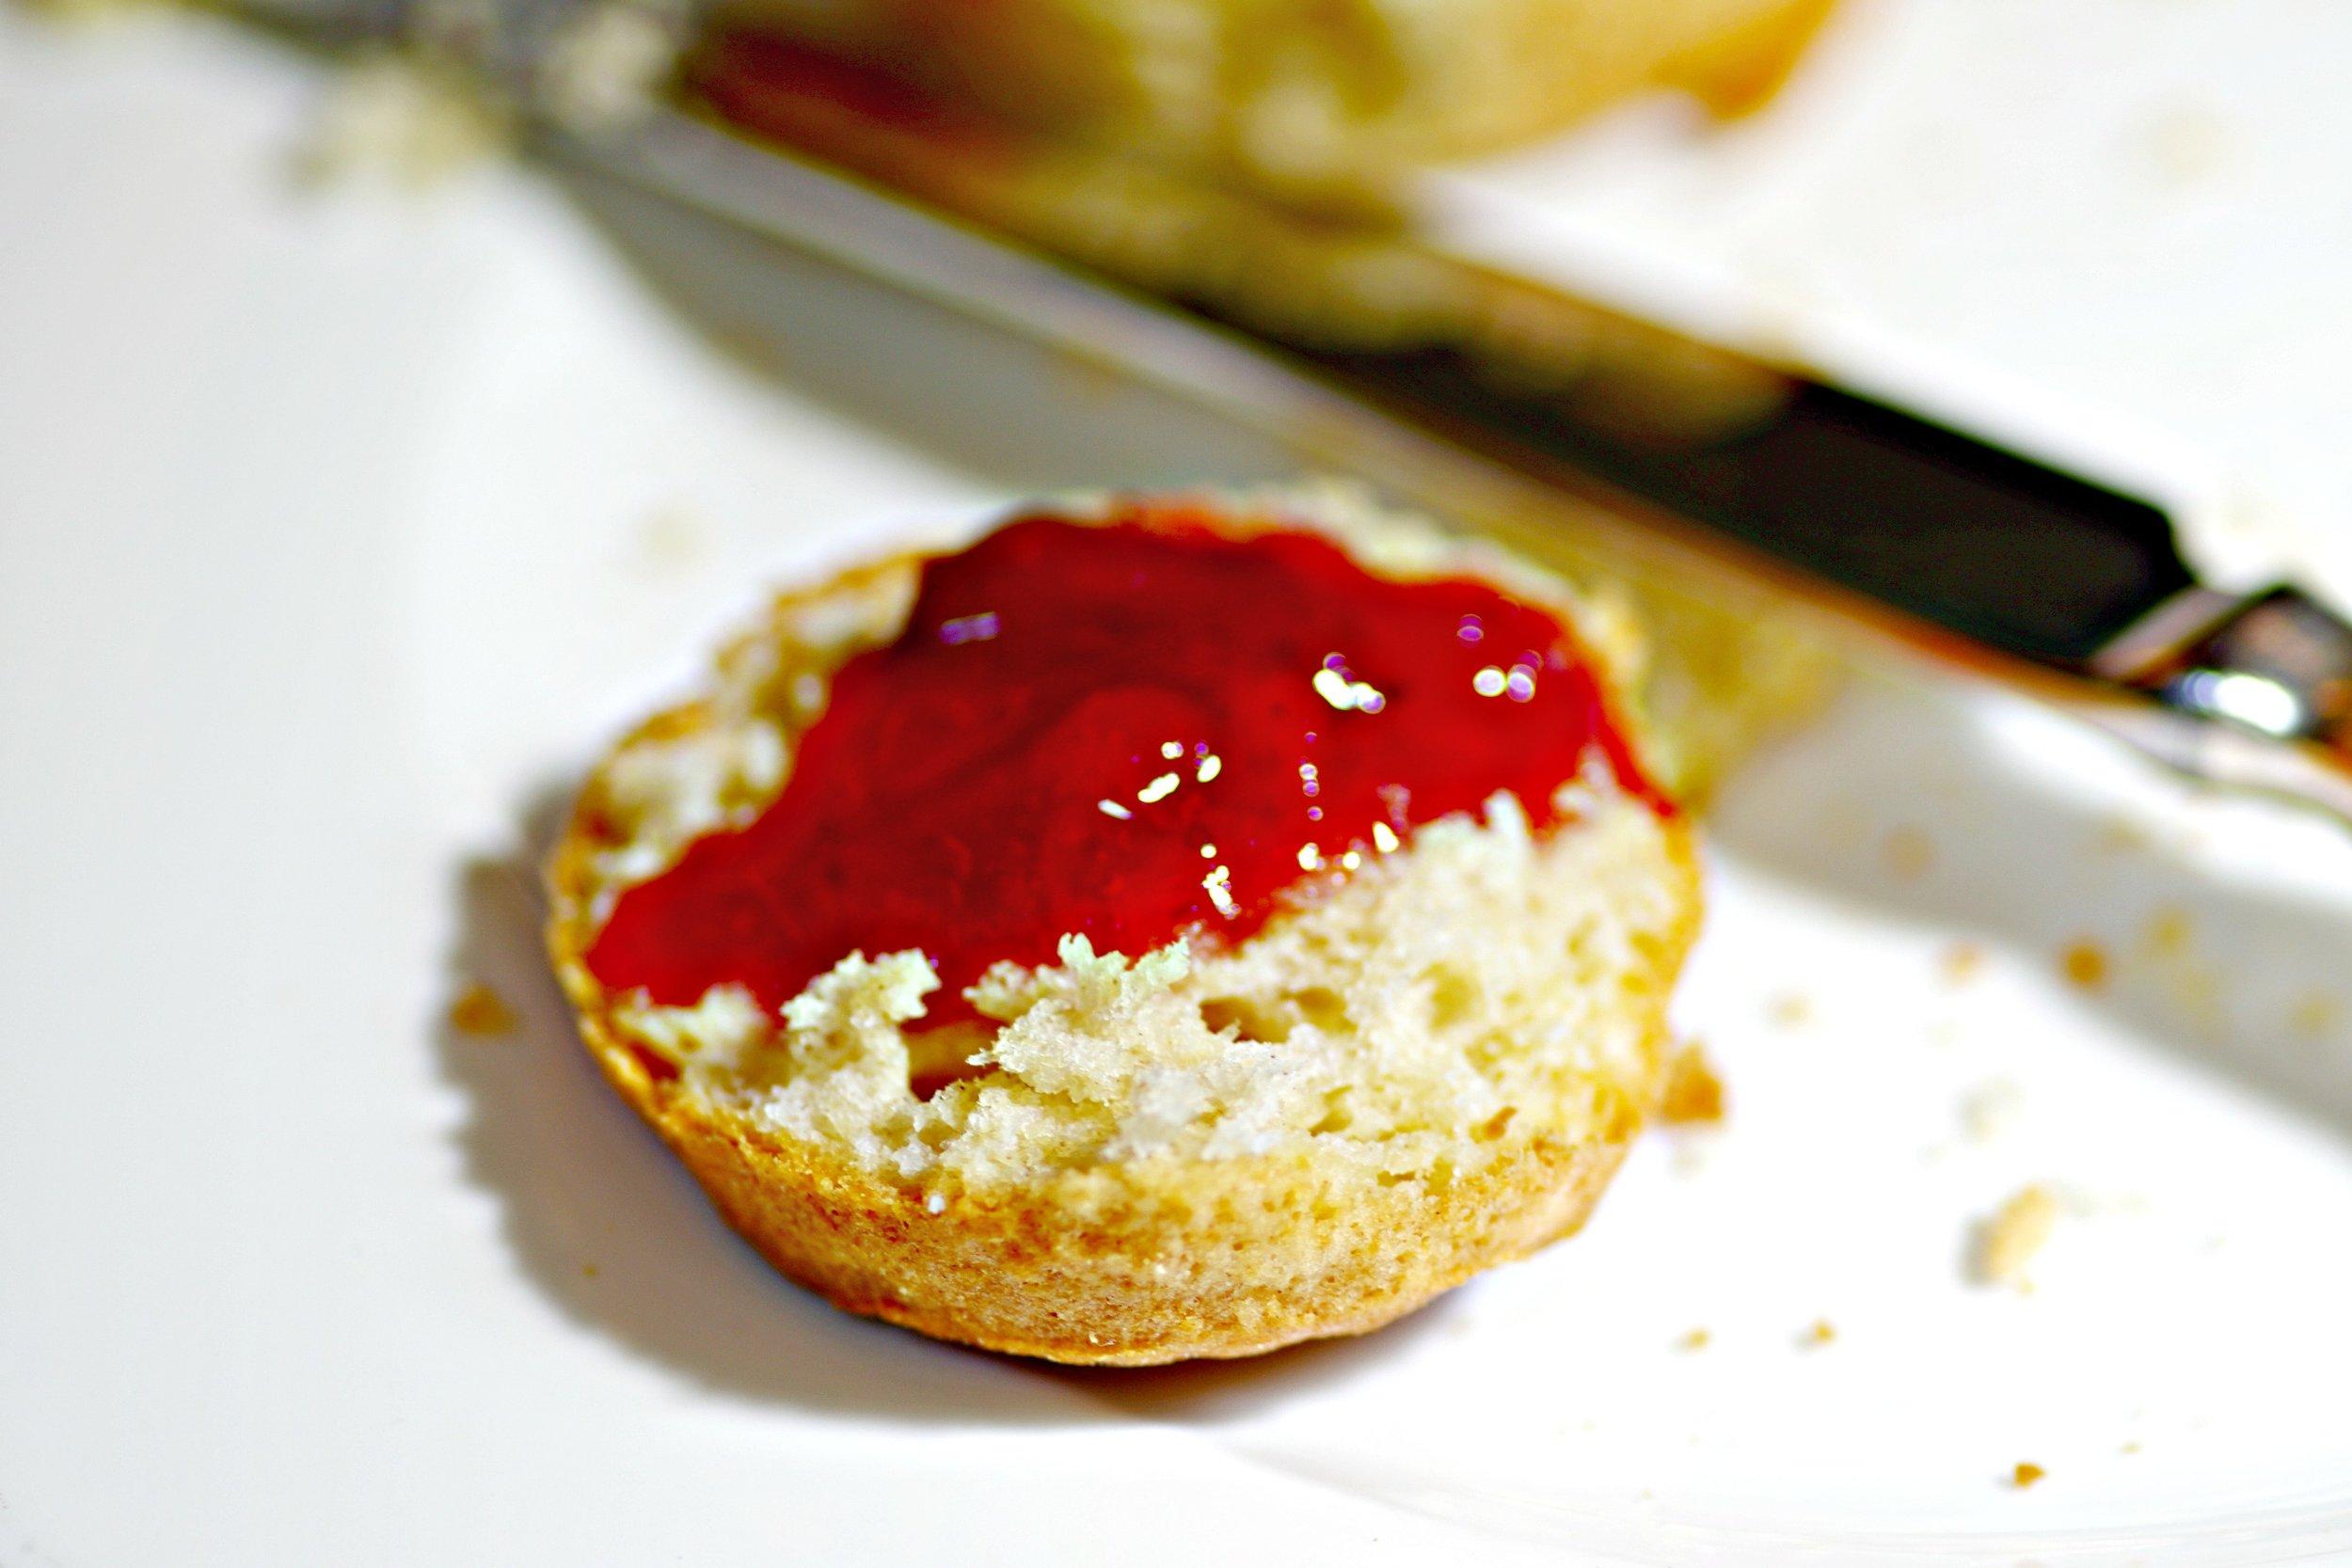 scone-with-jam.jpg